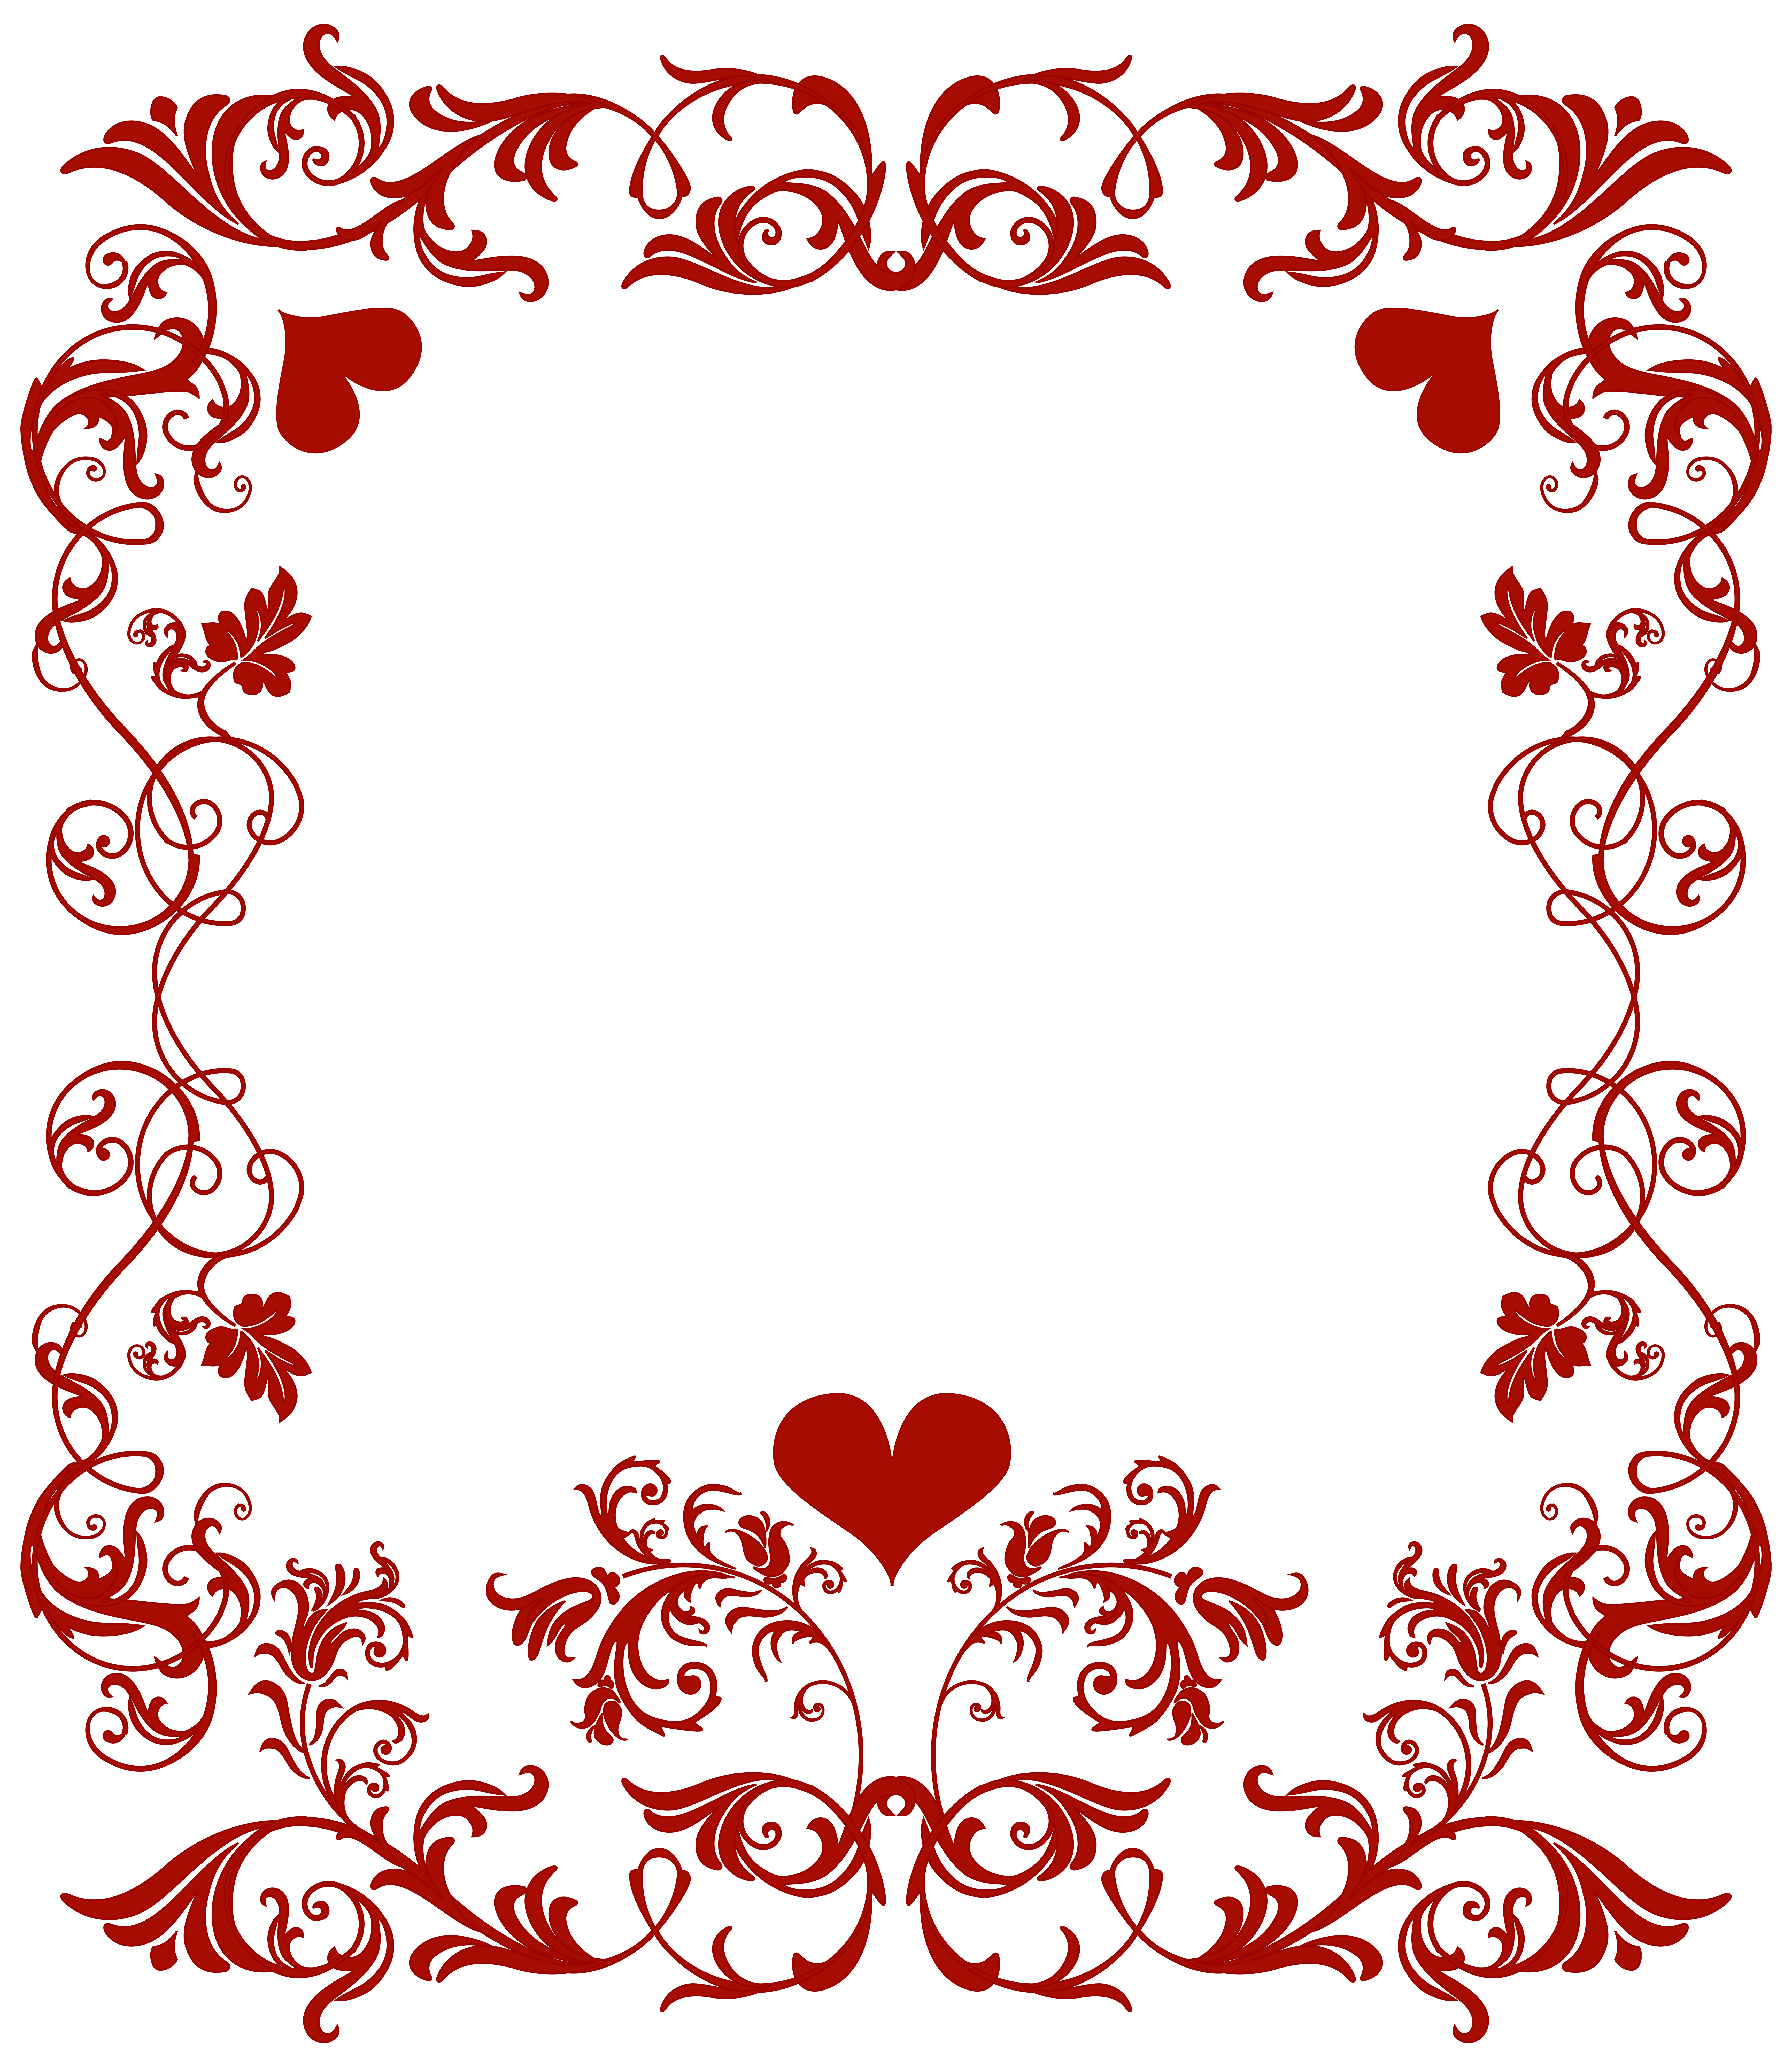 Valentine border clip art. February clipart banner